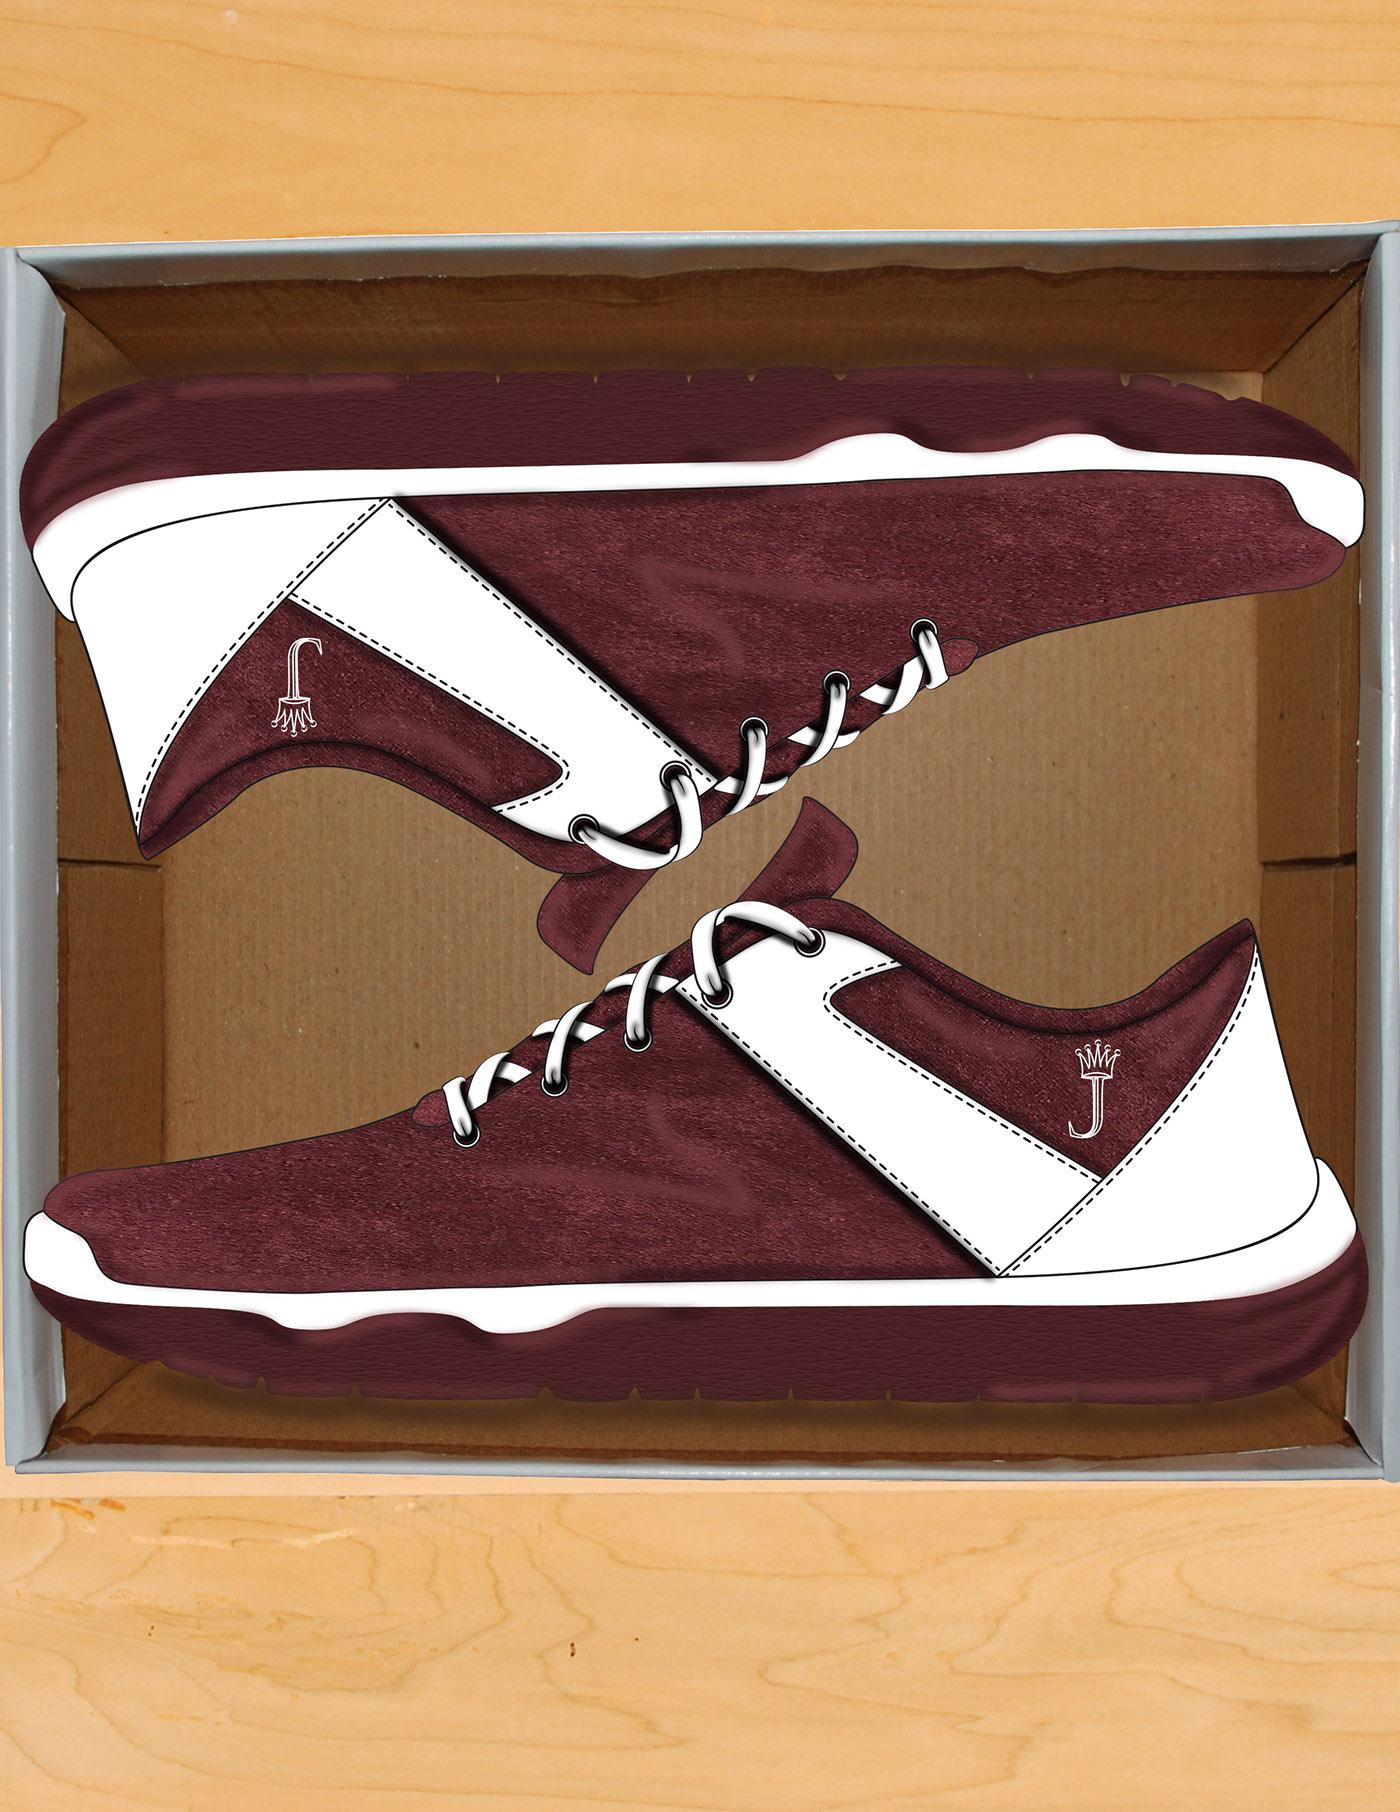 shoes sneakers art artwork ai Illustrator photoshop Urban Fashion